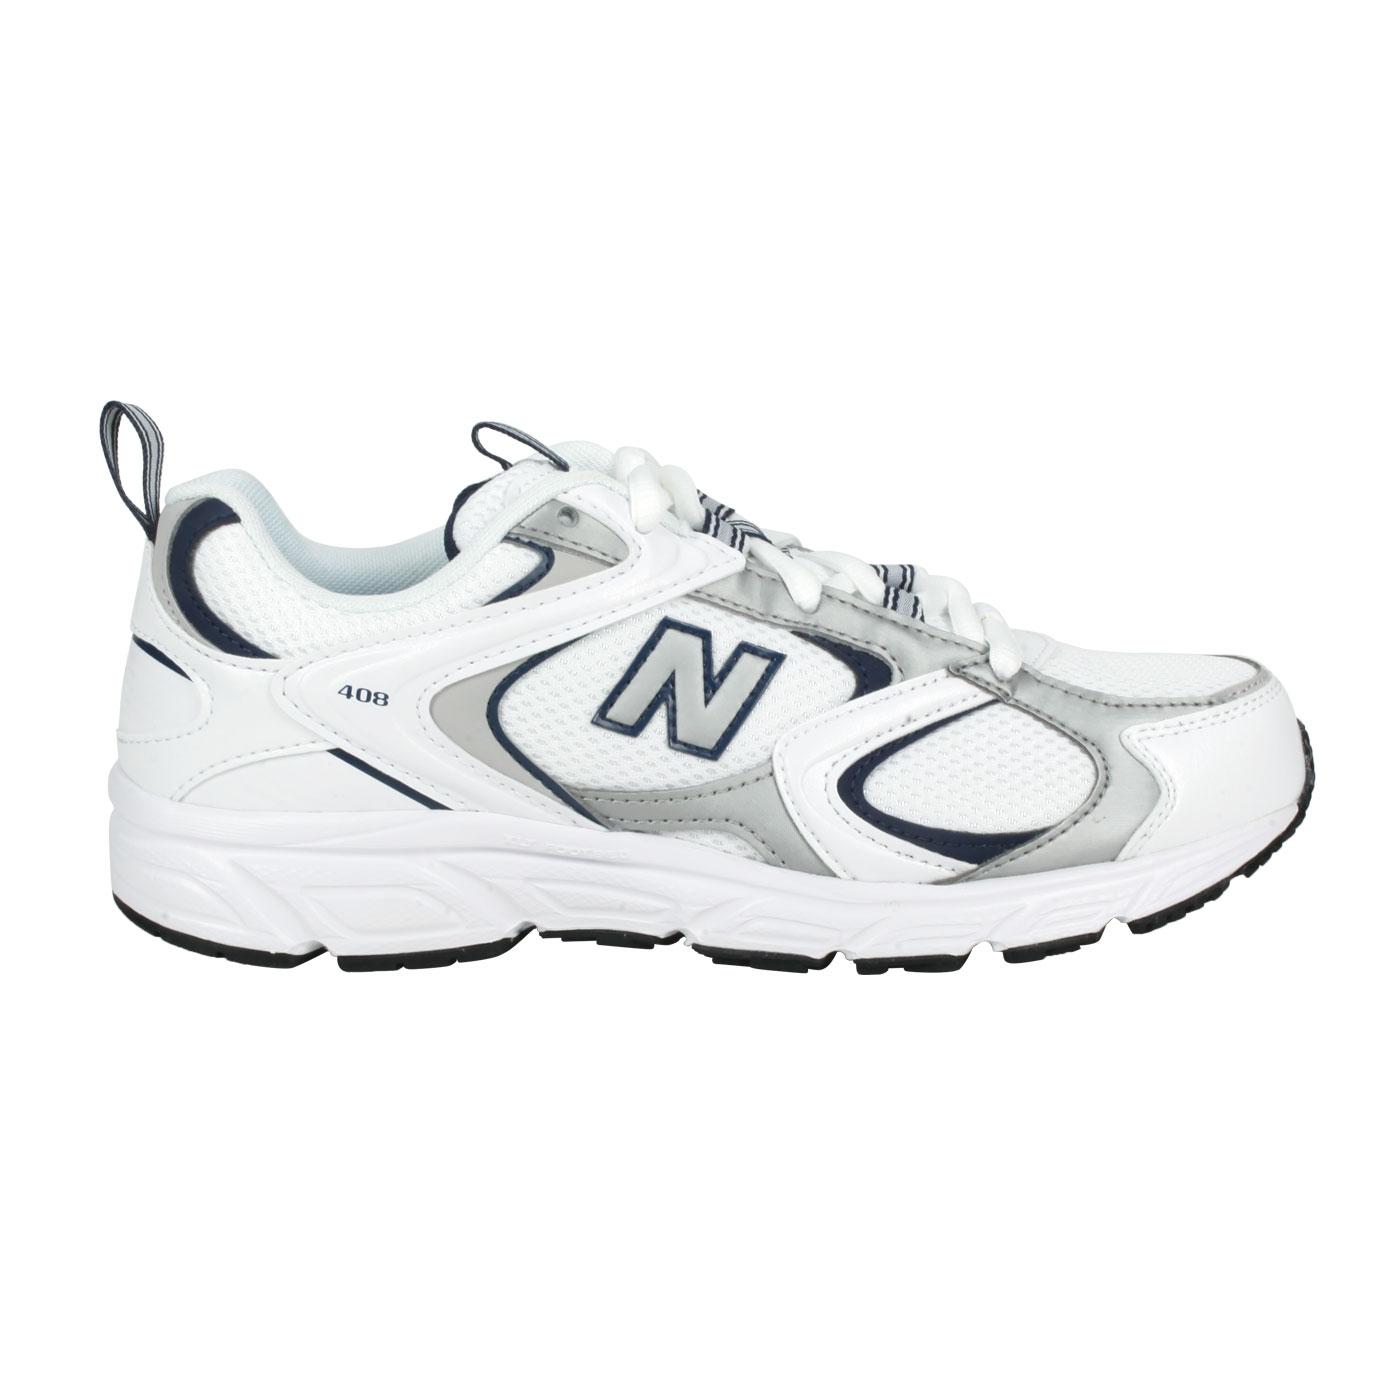 NEW BALANCE 女款復古運動鞋 ML408A - 白丈青